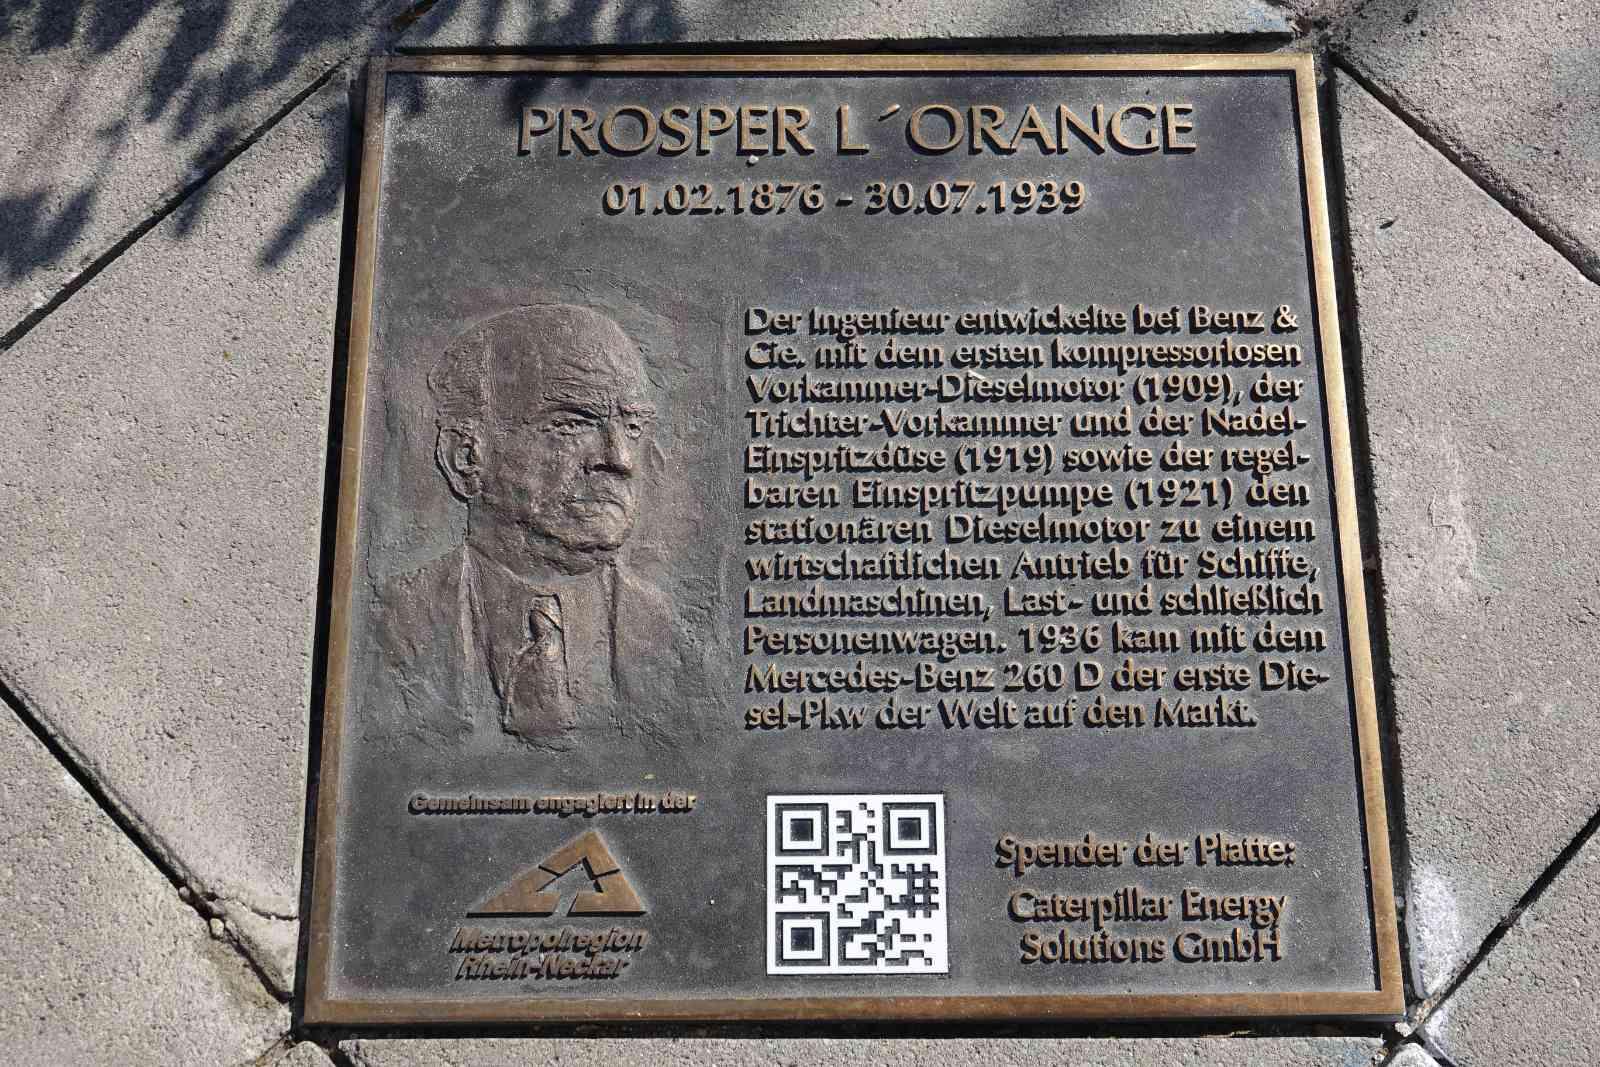 Bronze plaque for the engineer Prosper L'Orange in Mannheim